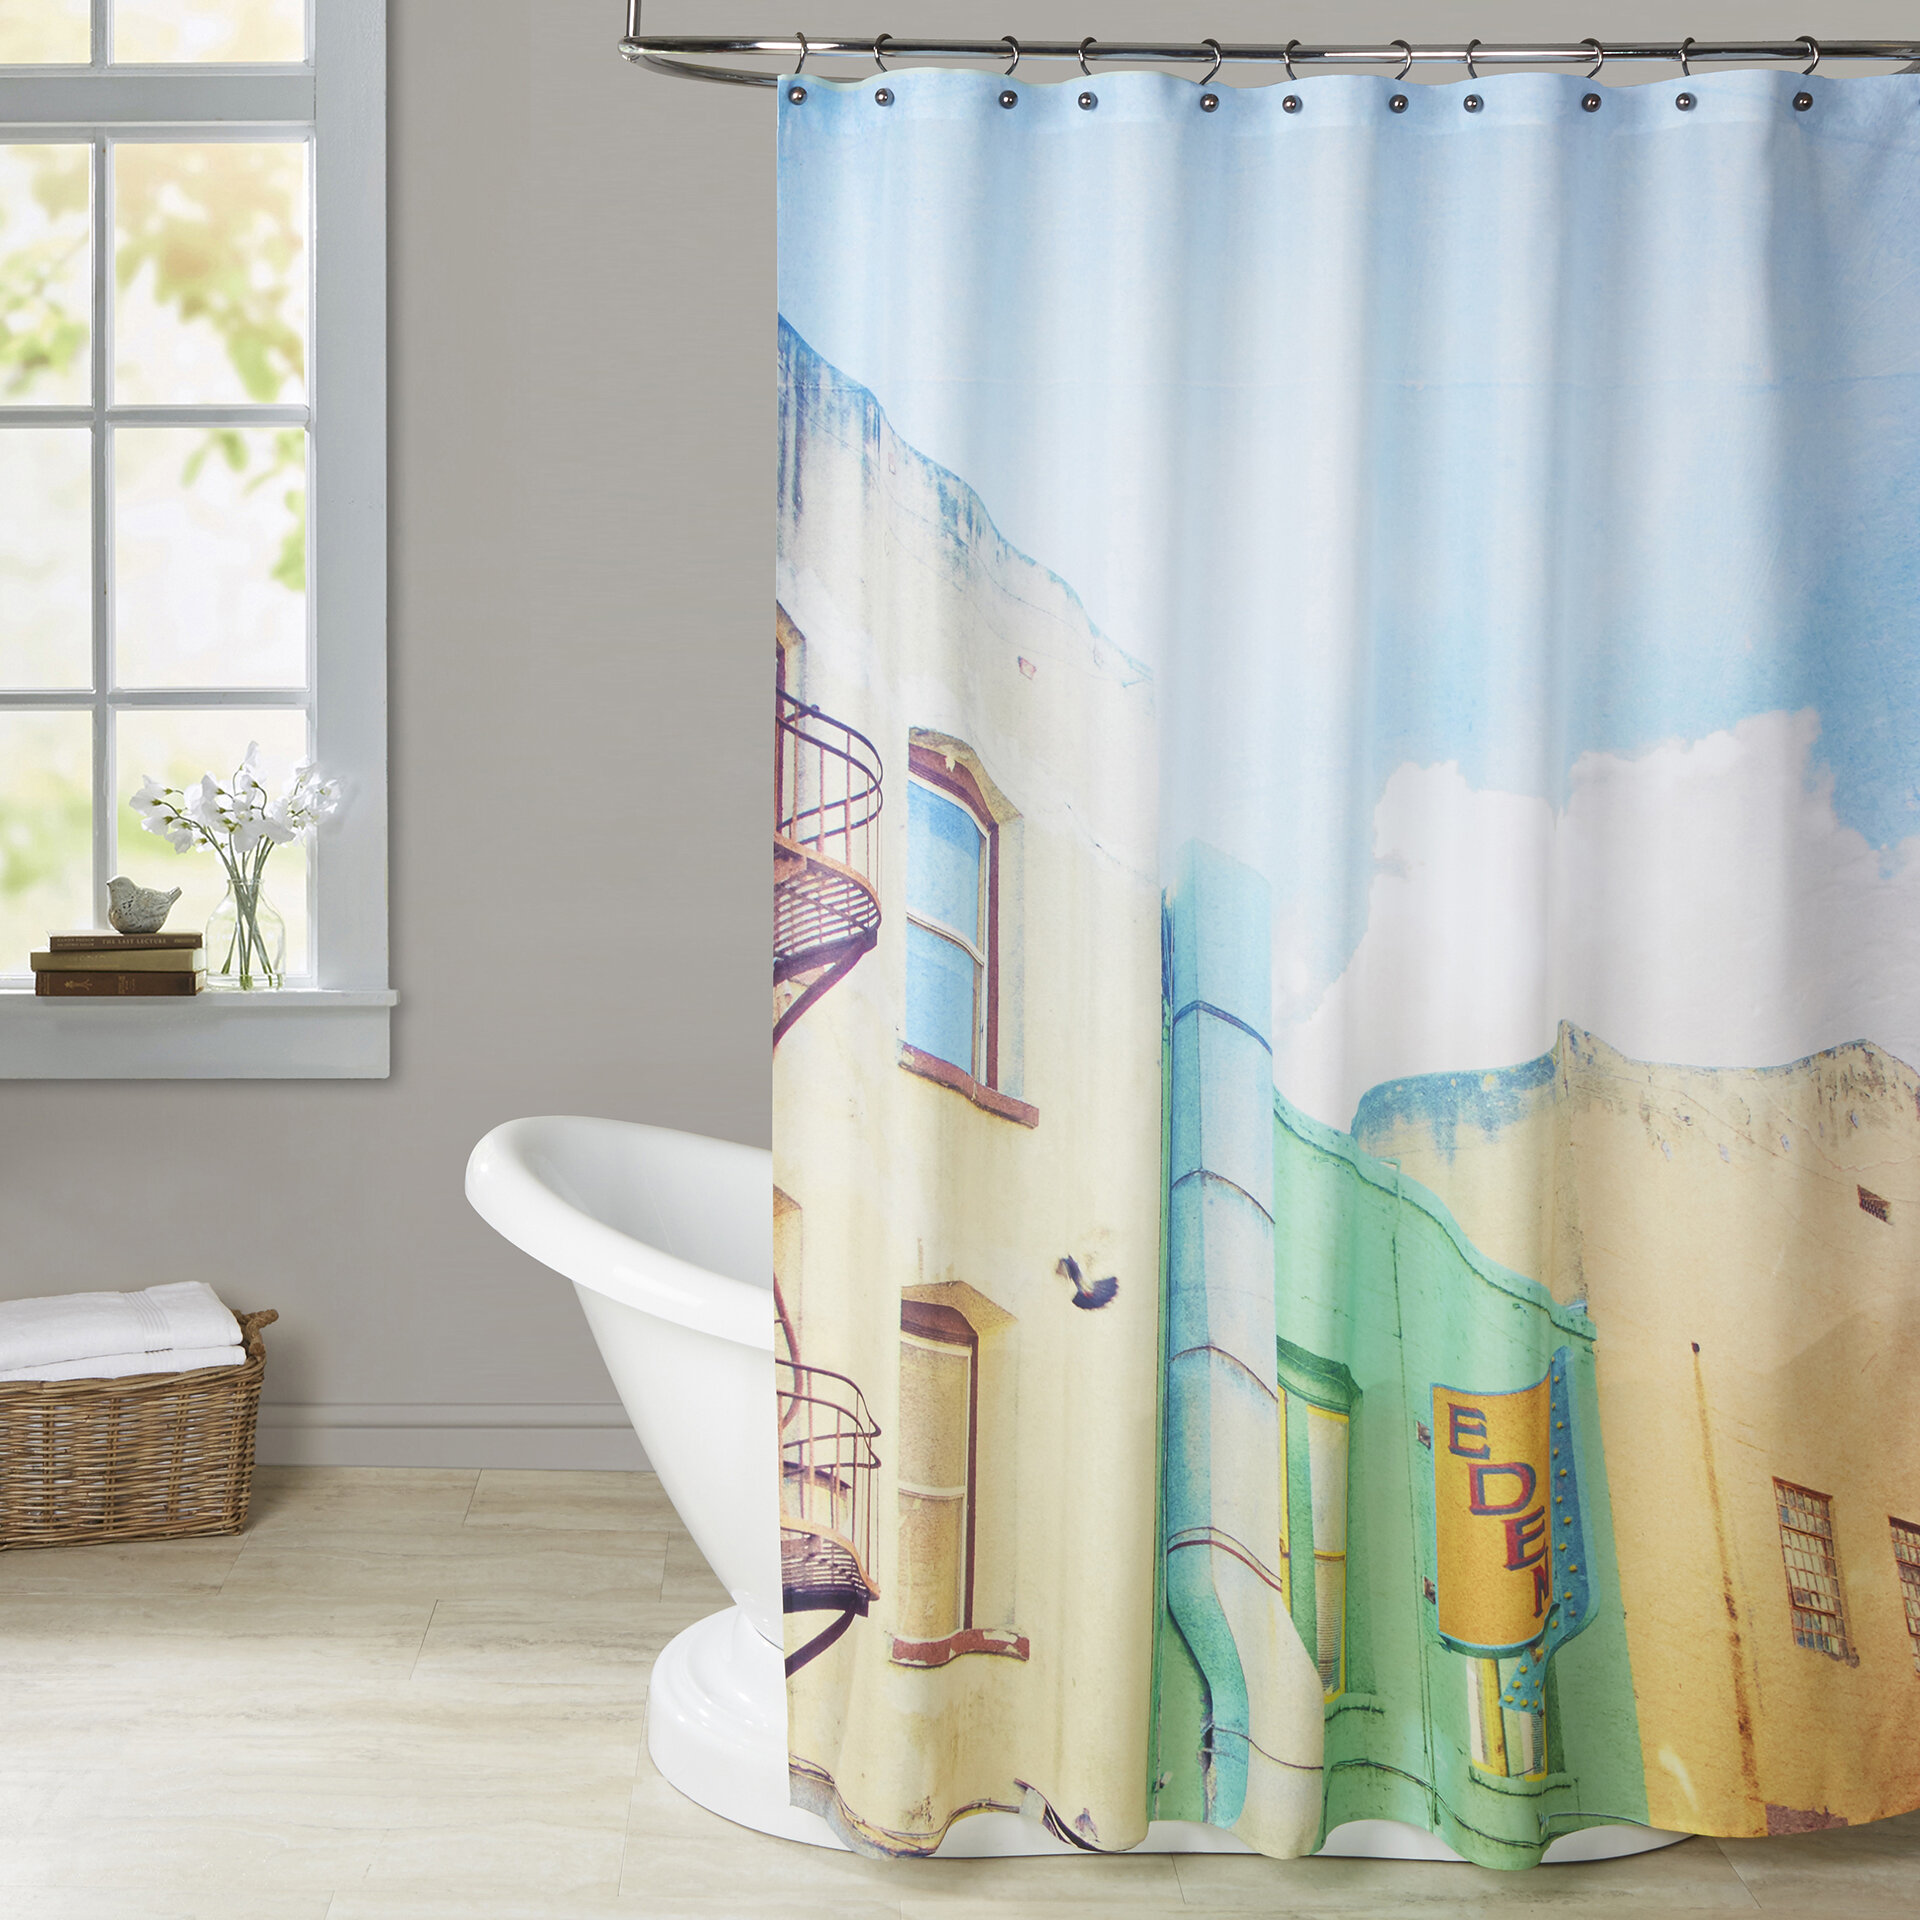 Brayden Studio Mina Teslaru San Francisco Tops 1 Shower Curtain